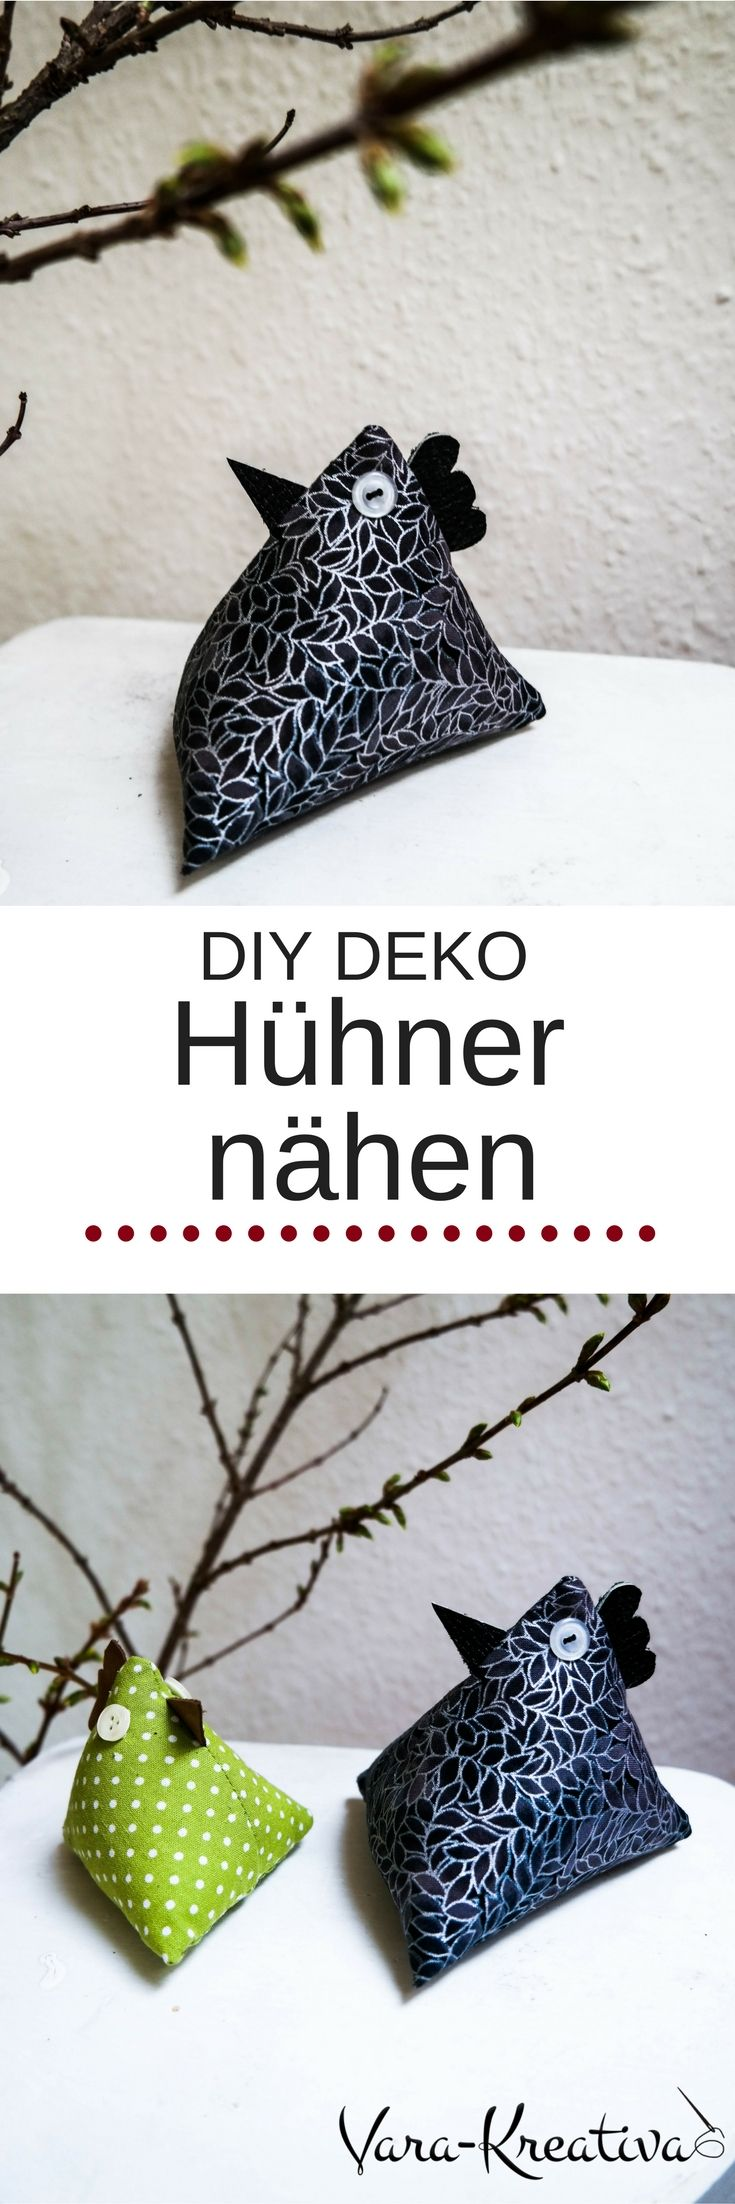 DIY Deko, Hühner nähen, DIY nähen, Geschenke, Frühling, Vara-Kreativa